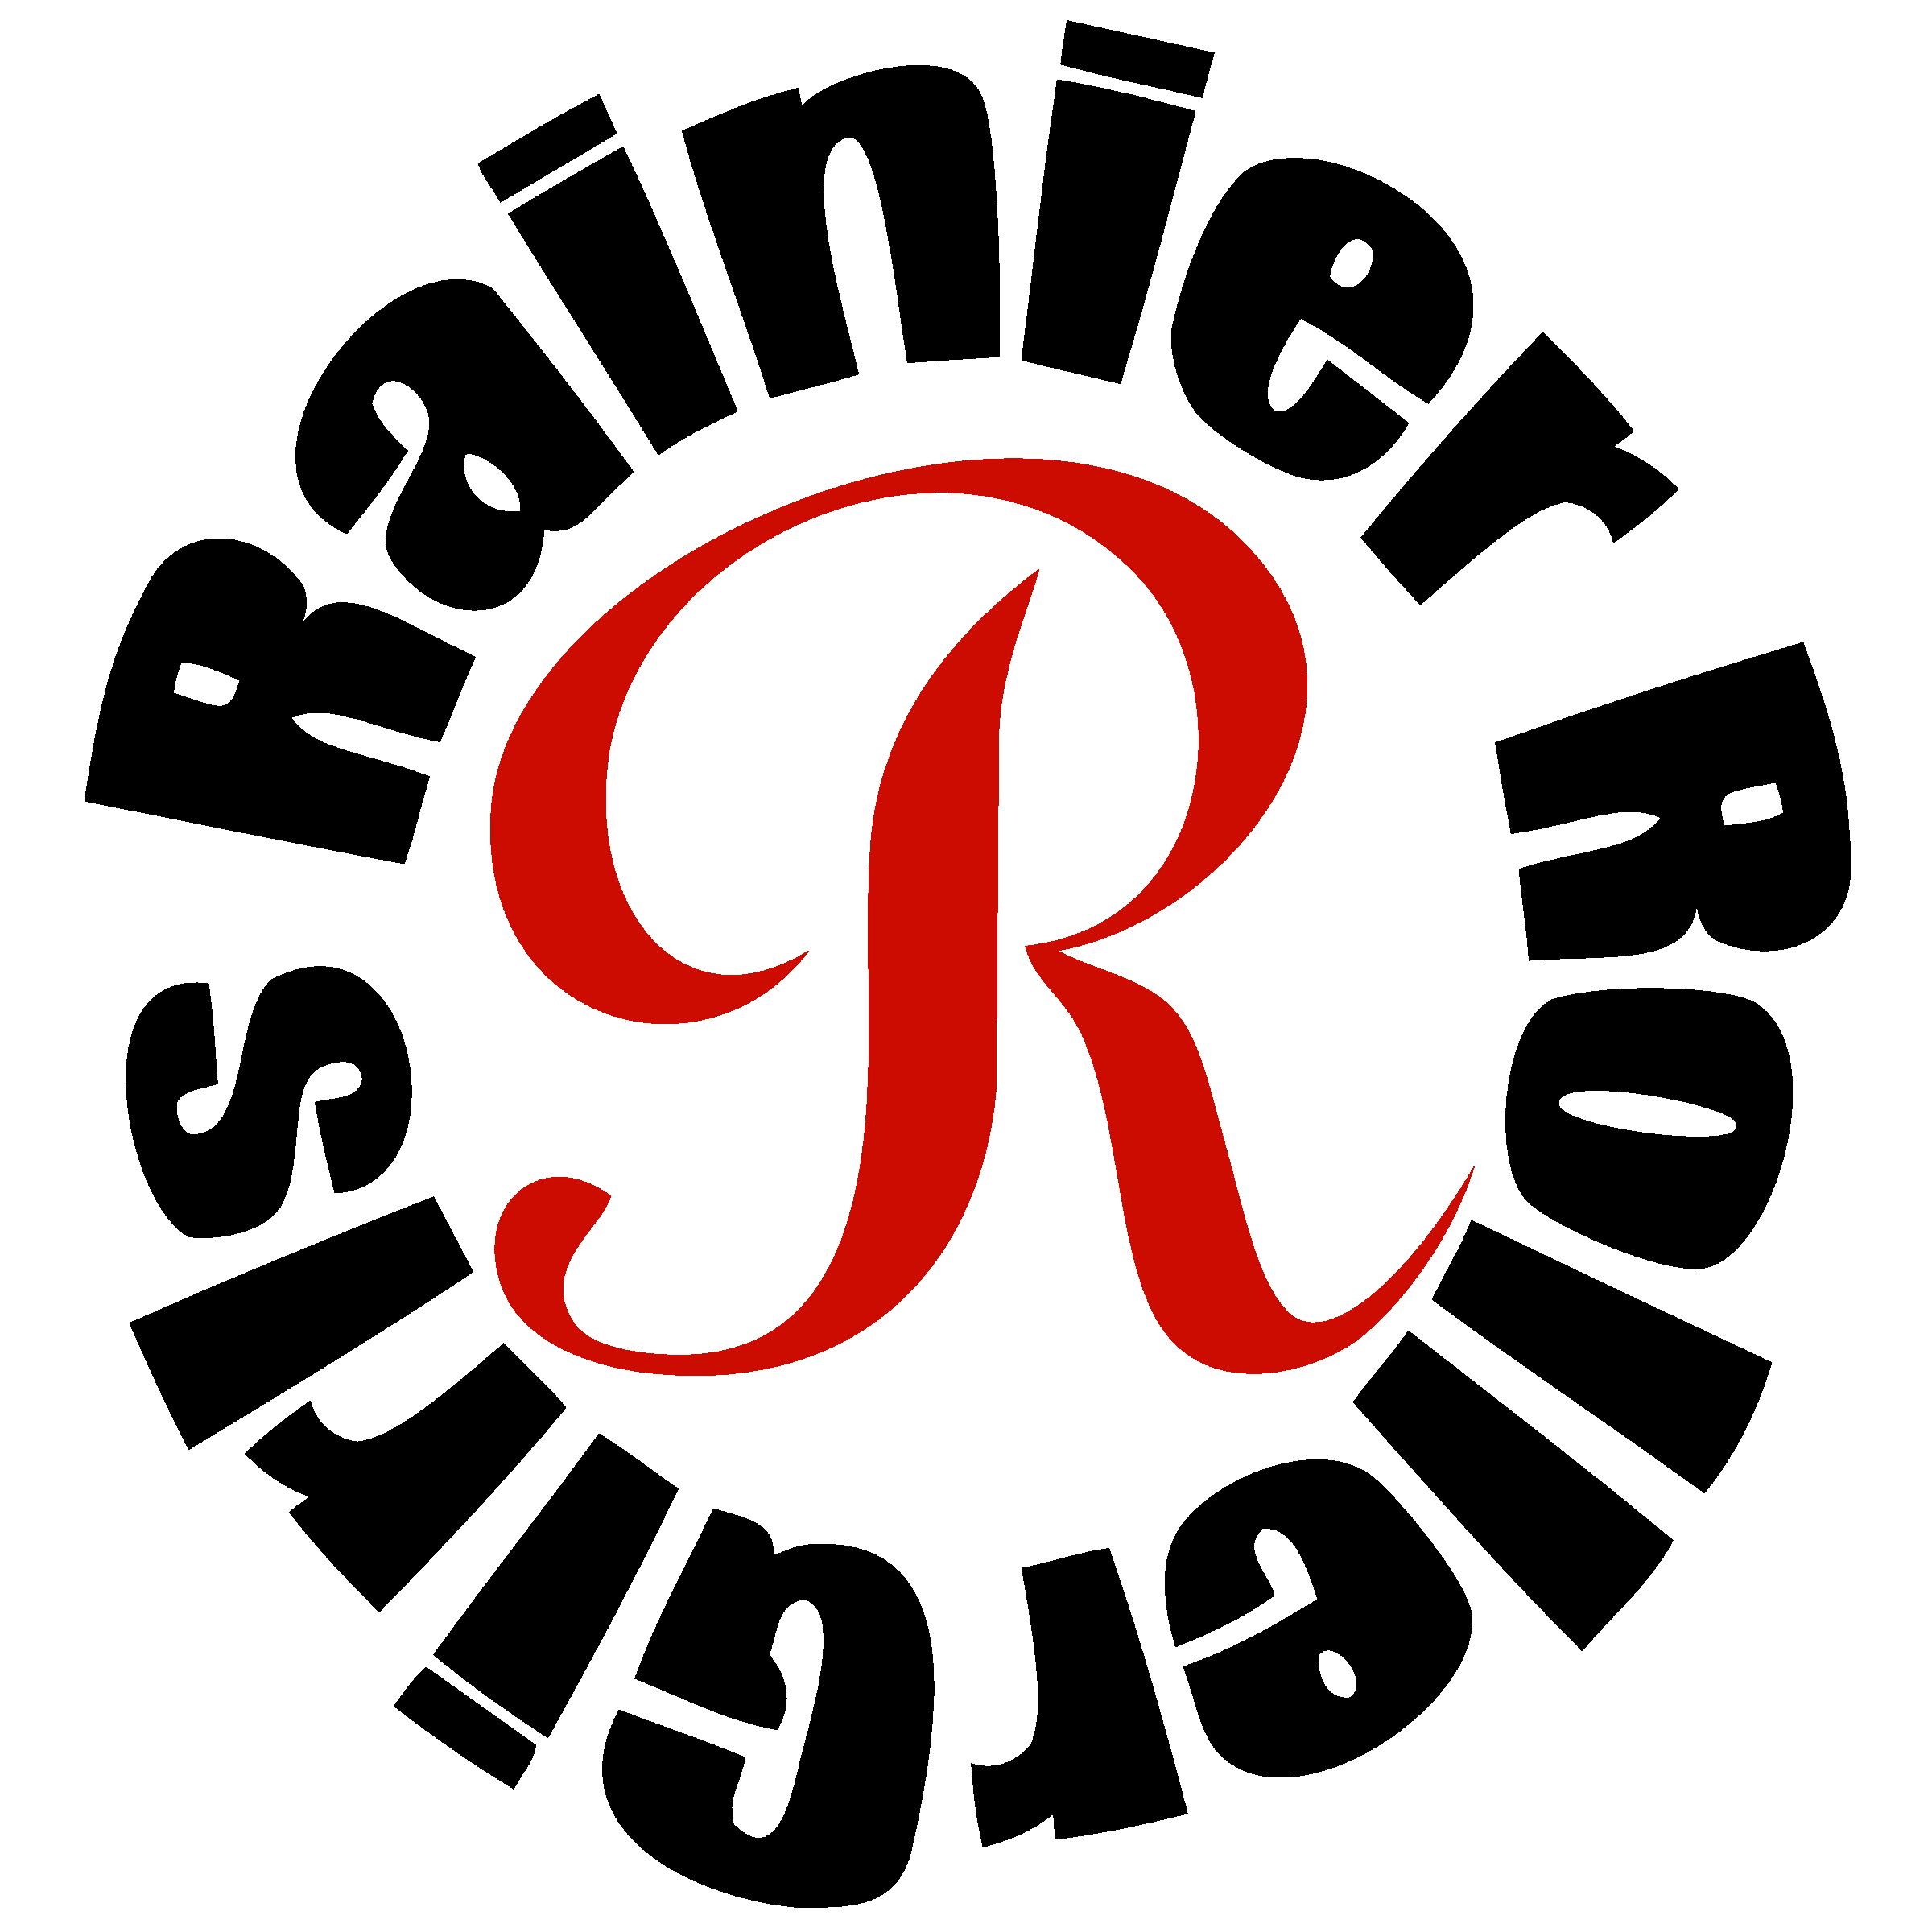 bigger_r_logo_by_gogo.png